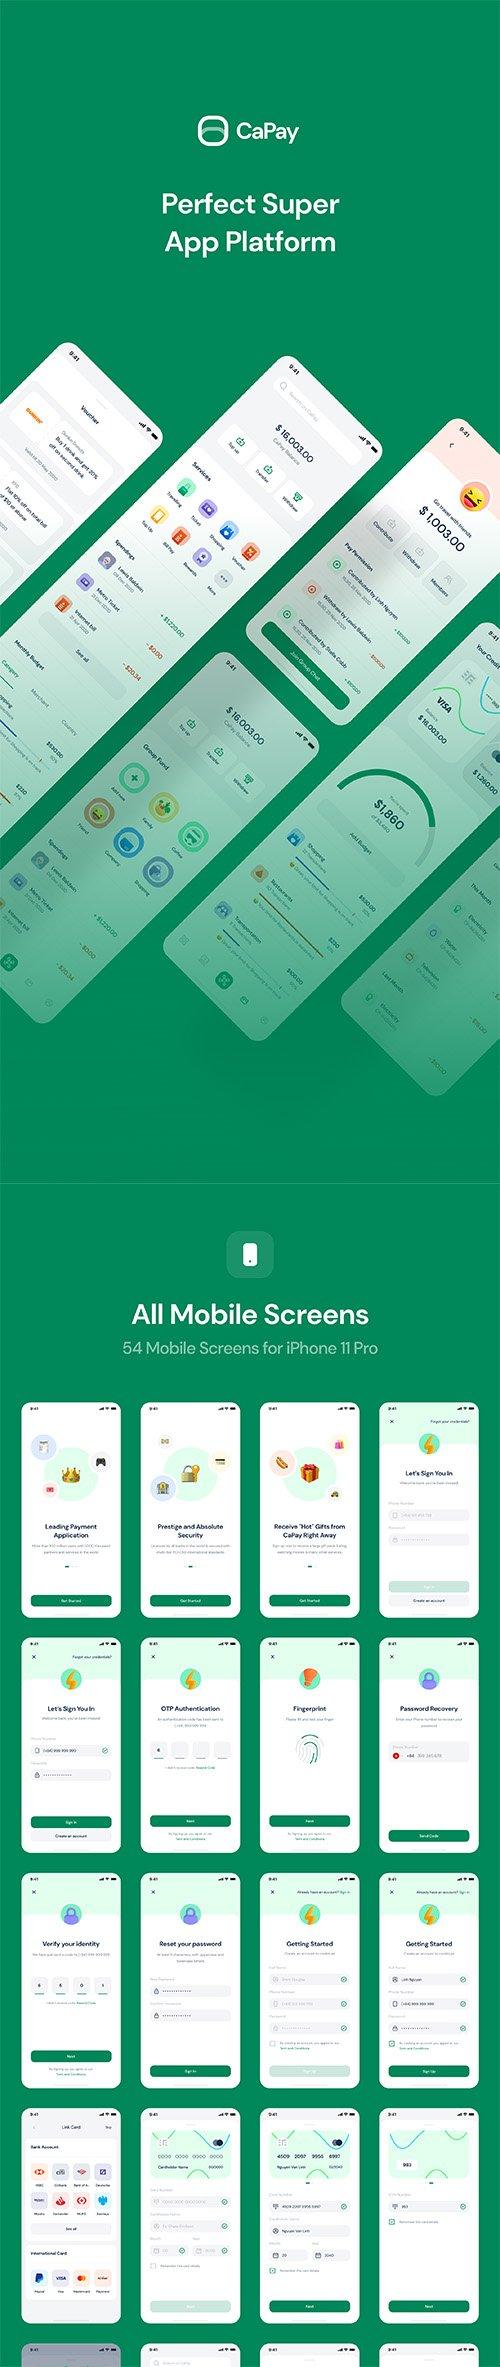 CaPay Wallet iOS UI Kit